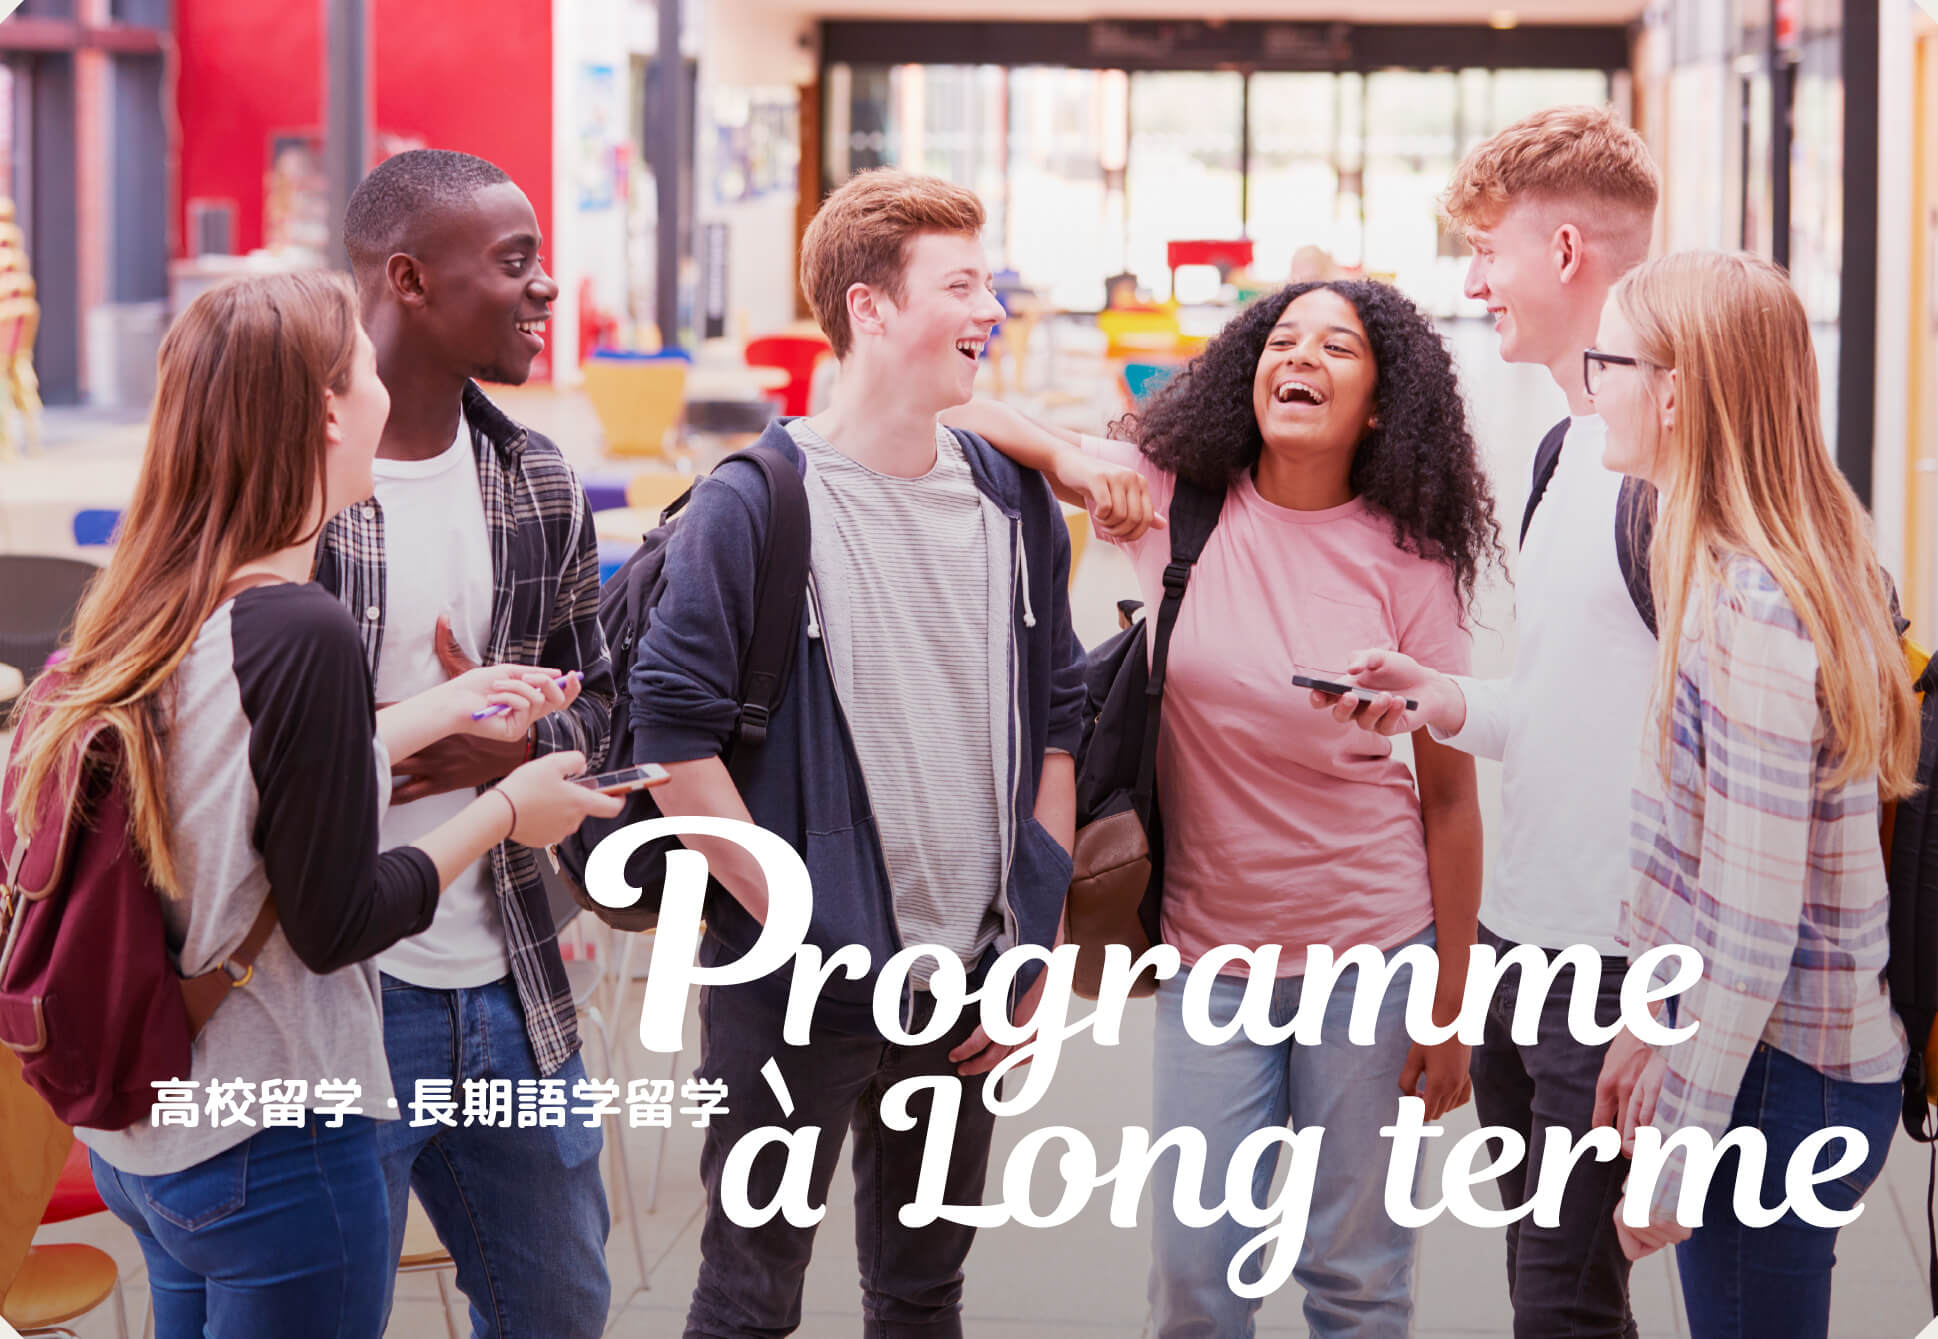 Programme a Long terme 高校留学・長期語学留学